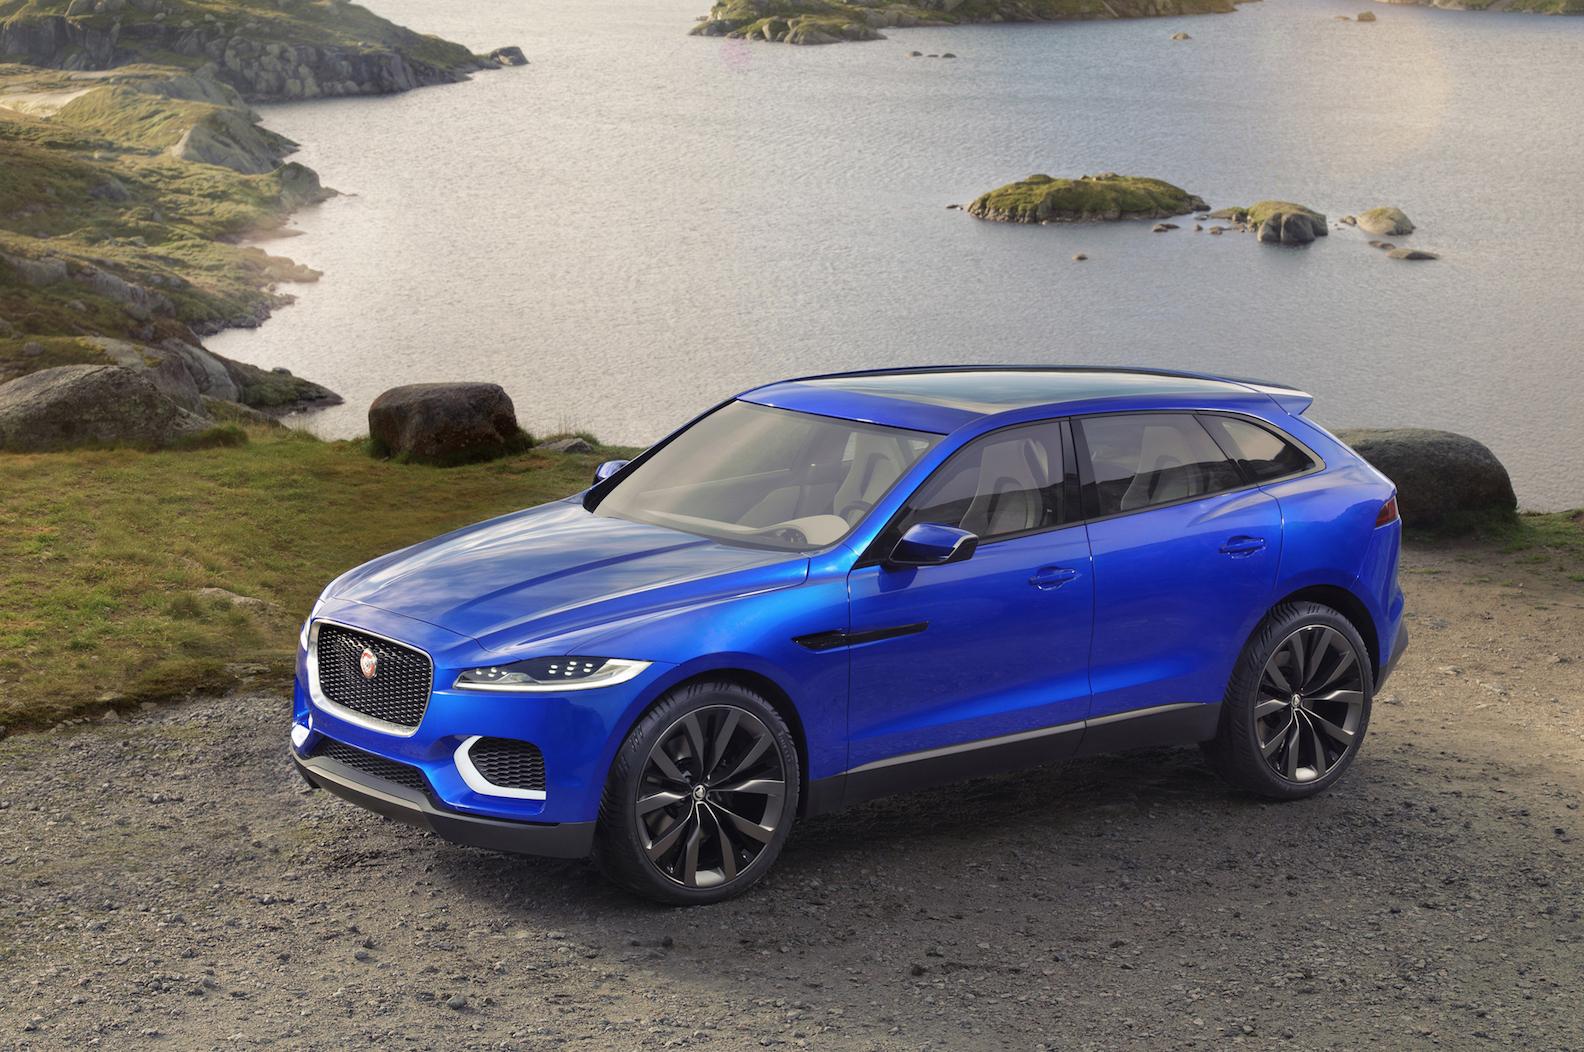 Jaguar F-Pace: A New Luxury SUV